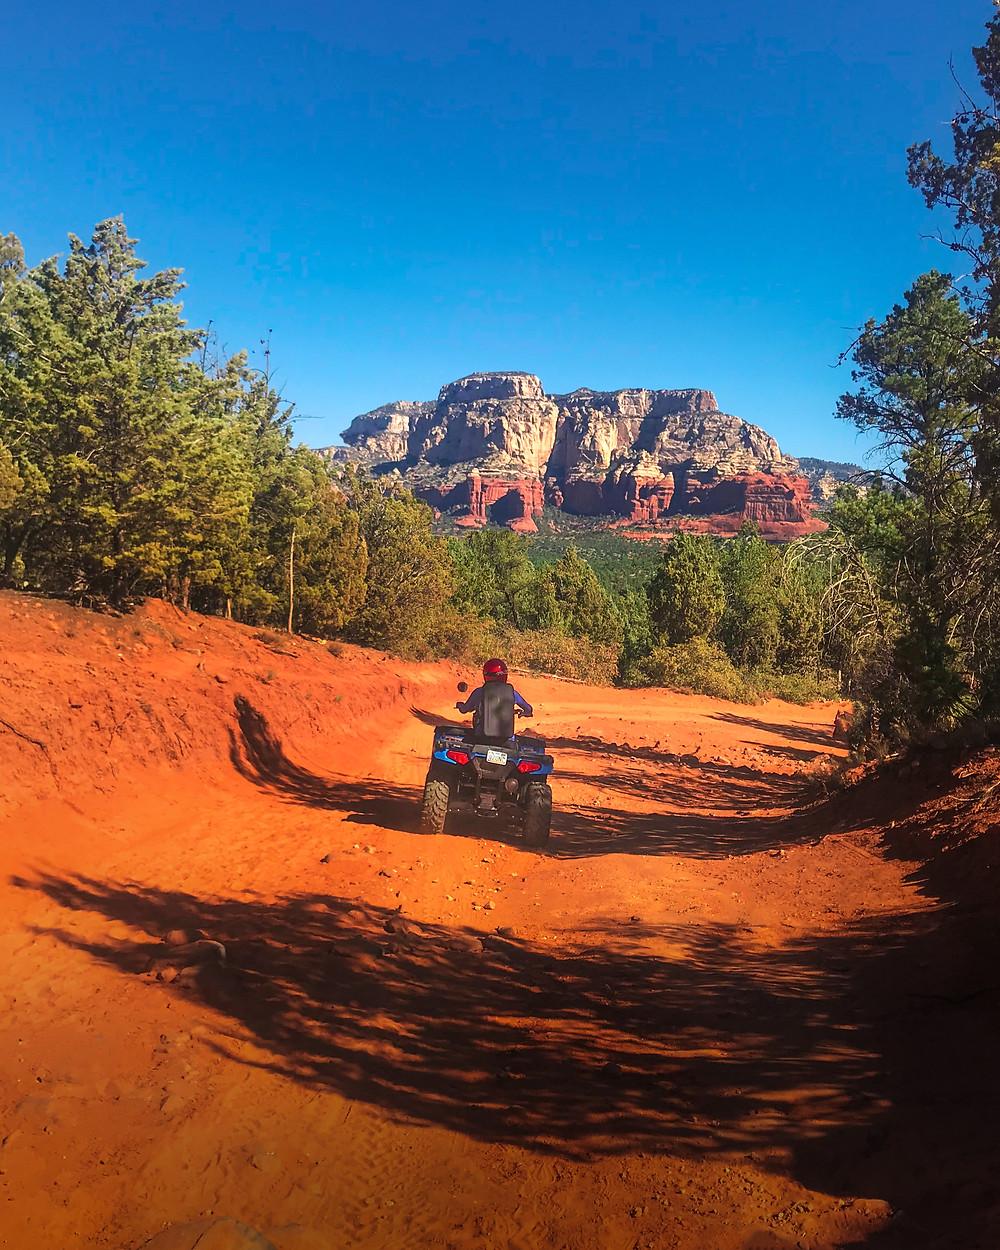 atv rider on the Sedona trails